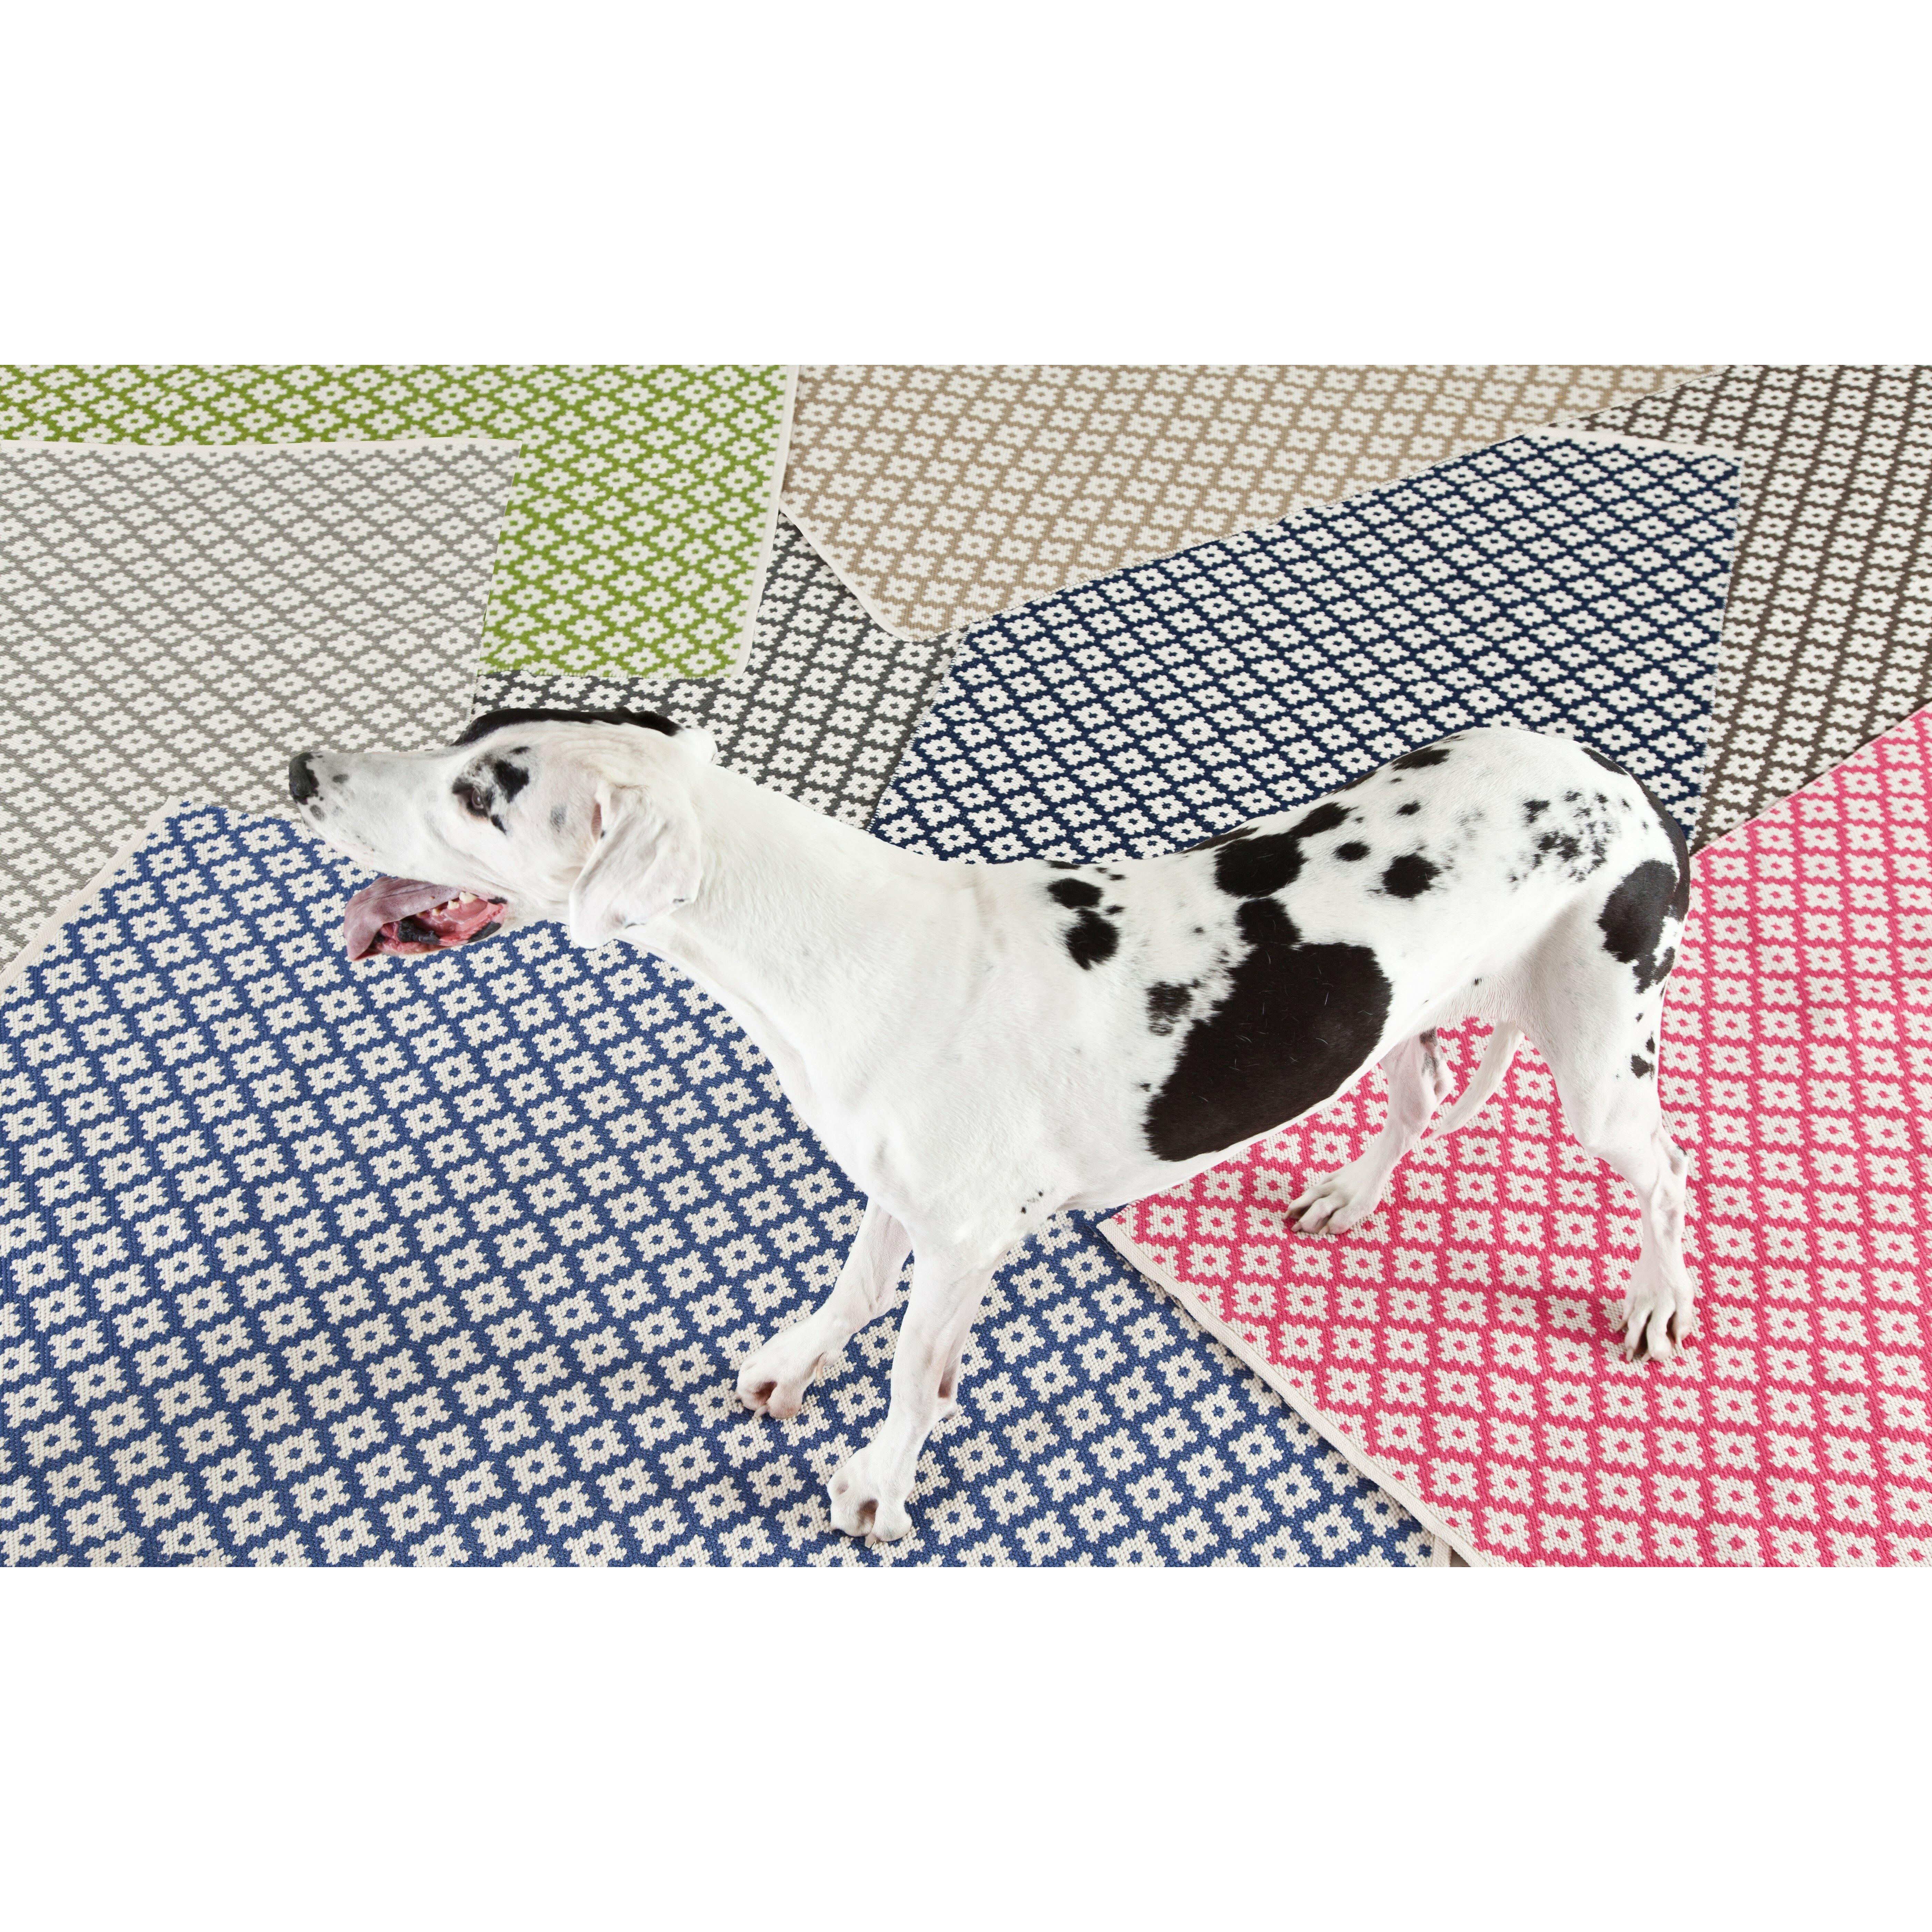 Dash and albert rugs samode hand woven beige indoor for Albert and dash outdoor rugs